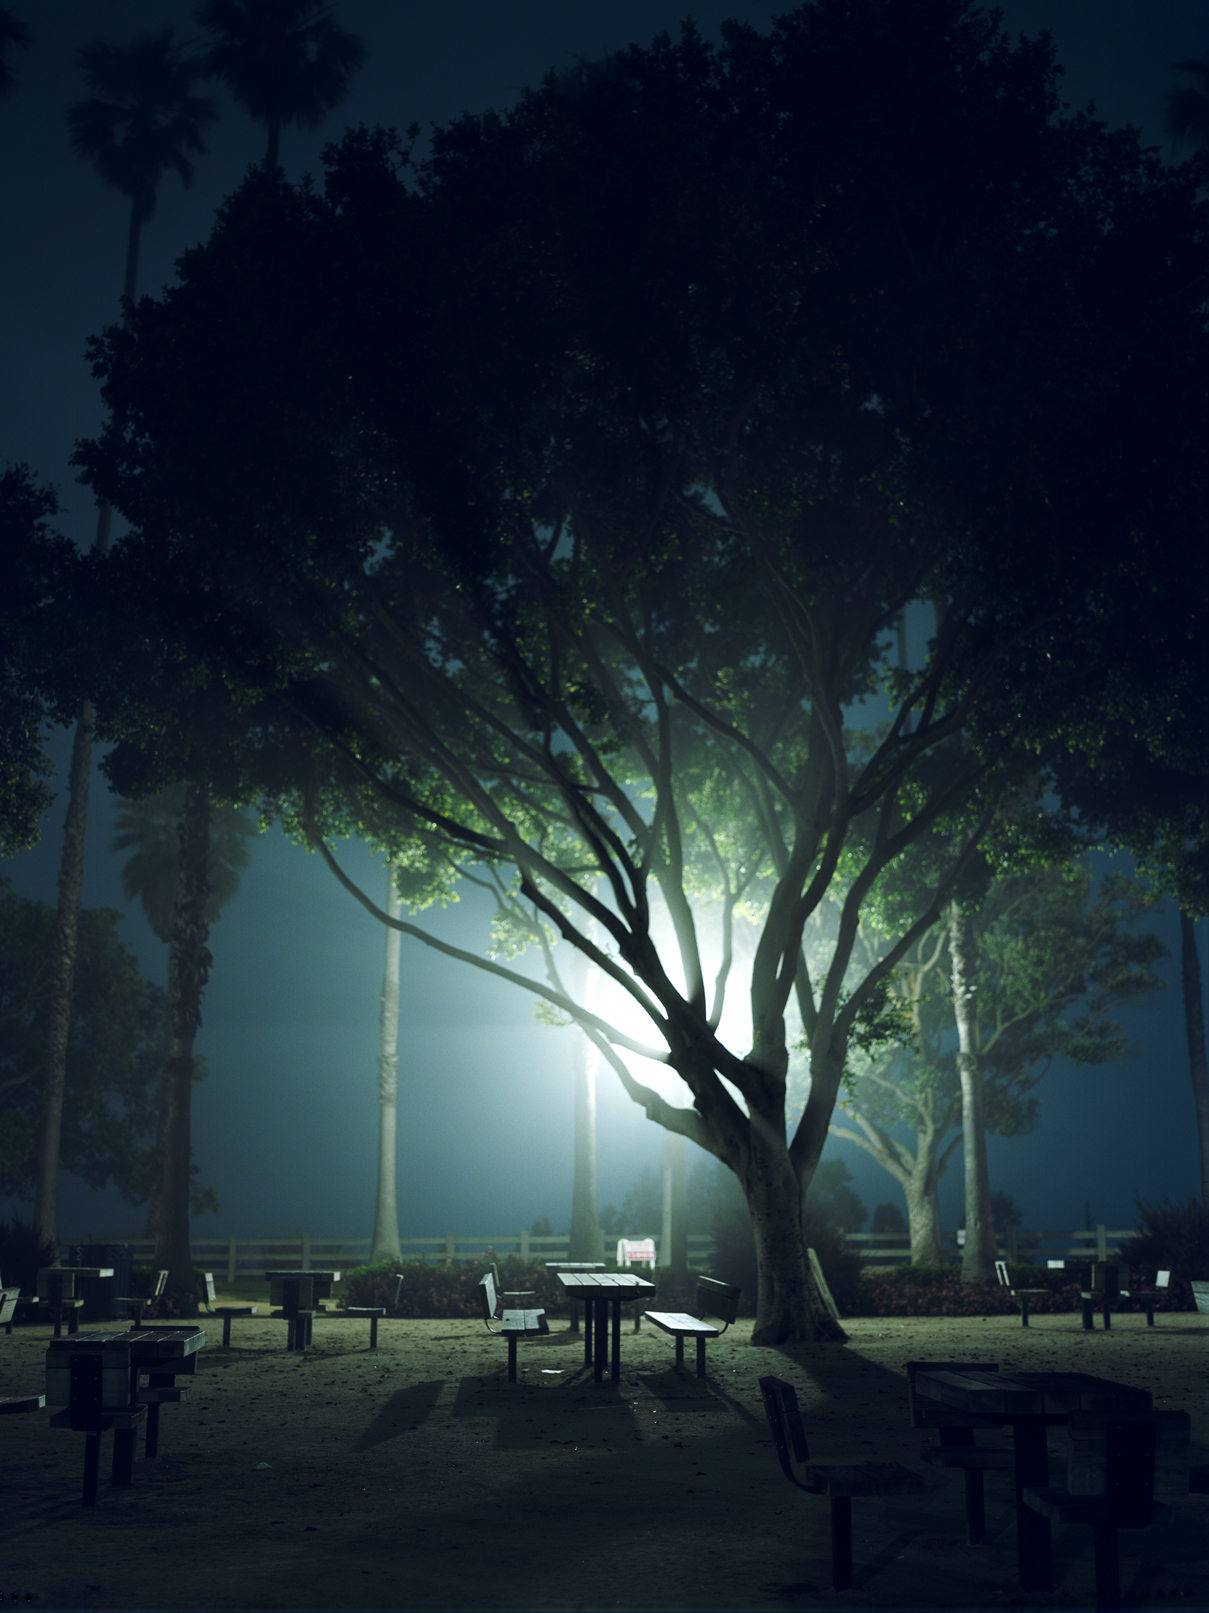 park.benches.santa.monica.r.1.etsy.jpg